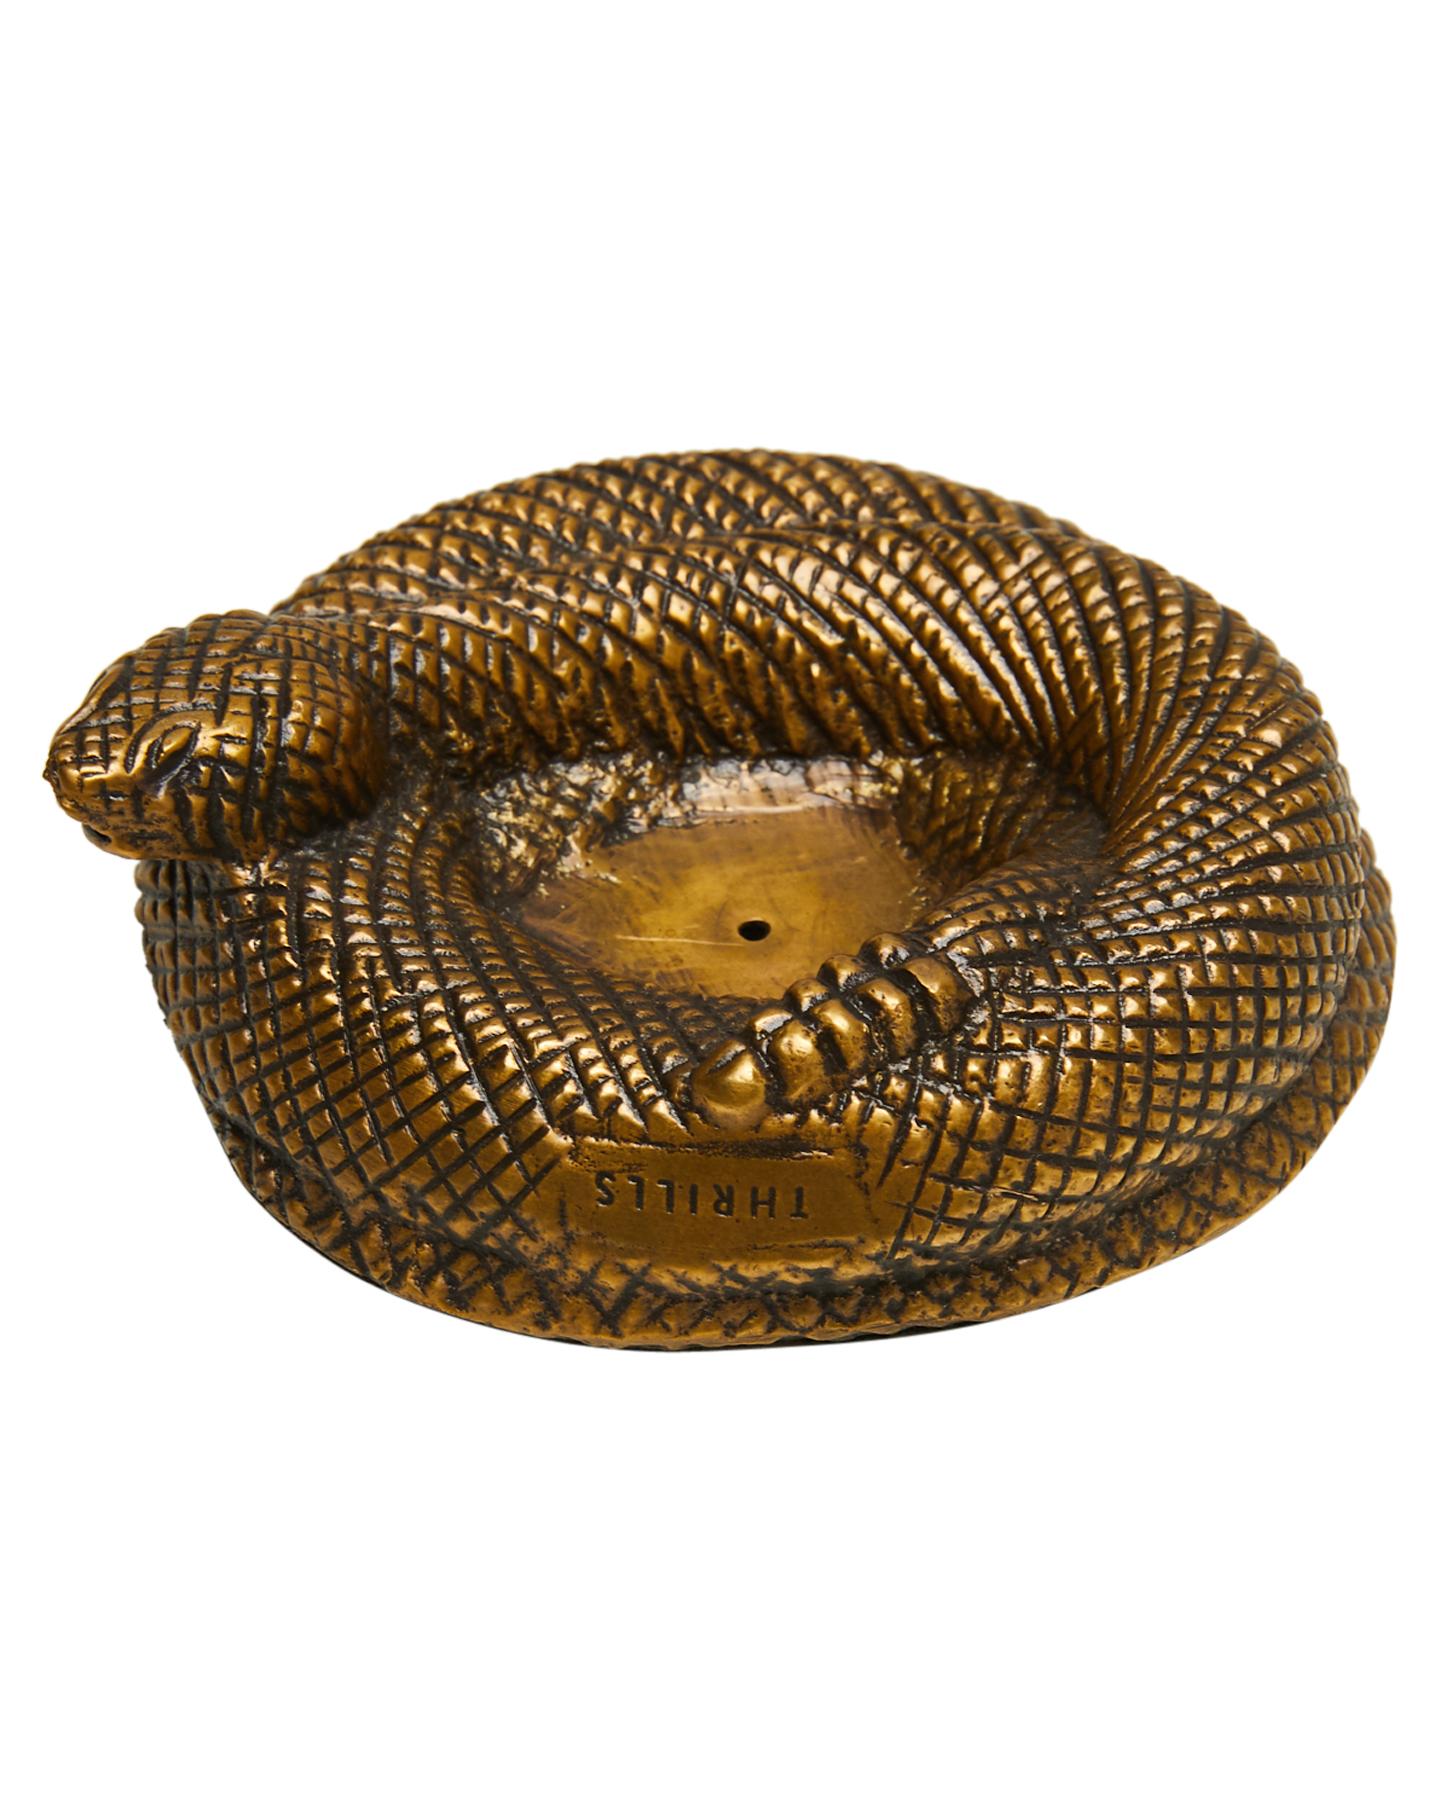 Thrills Rattlesnake Incense Holder Anti Brass Anti Brass